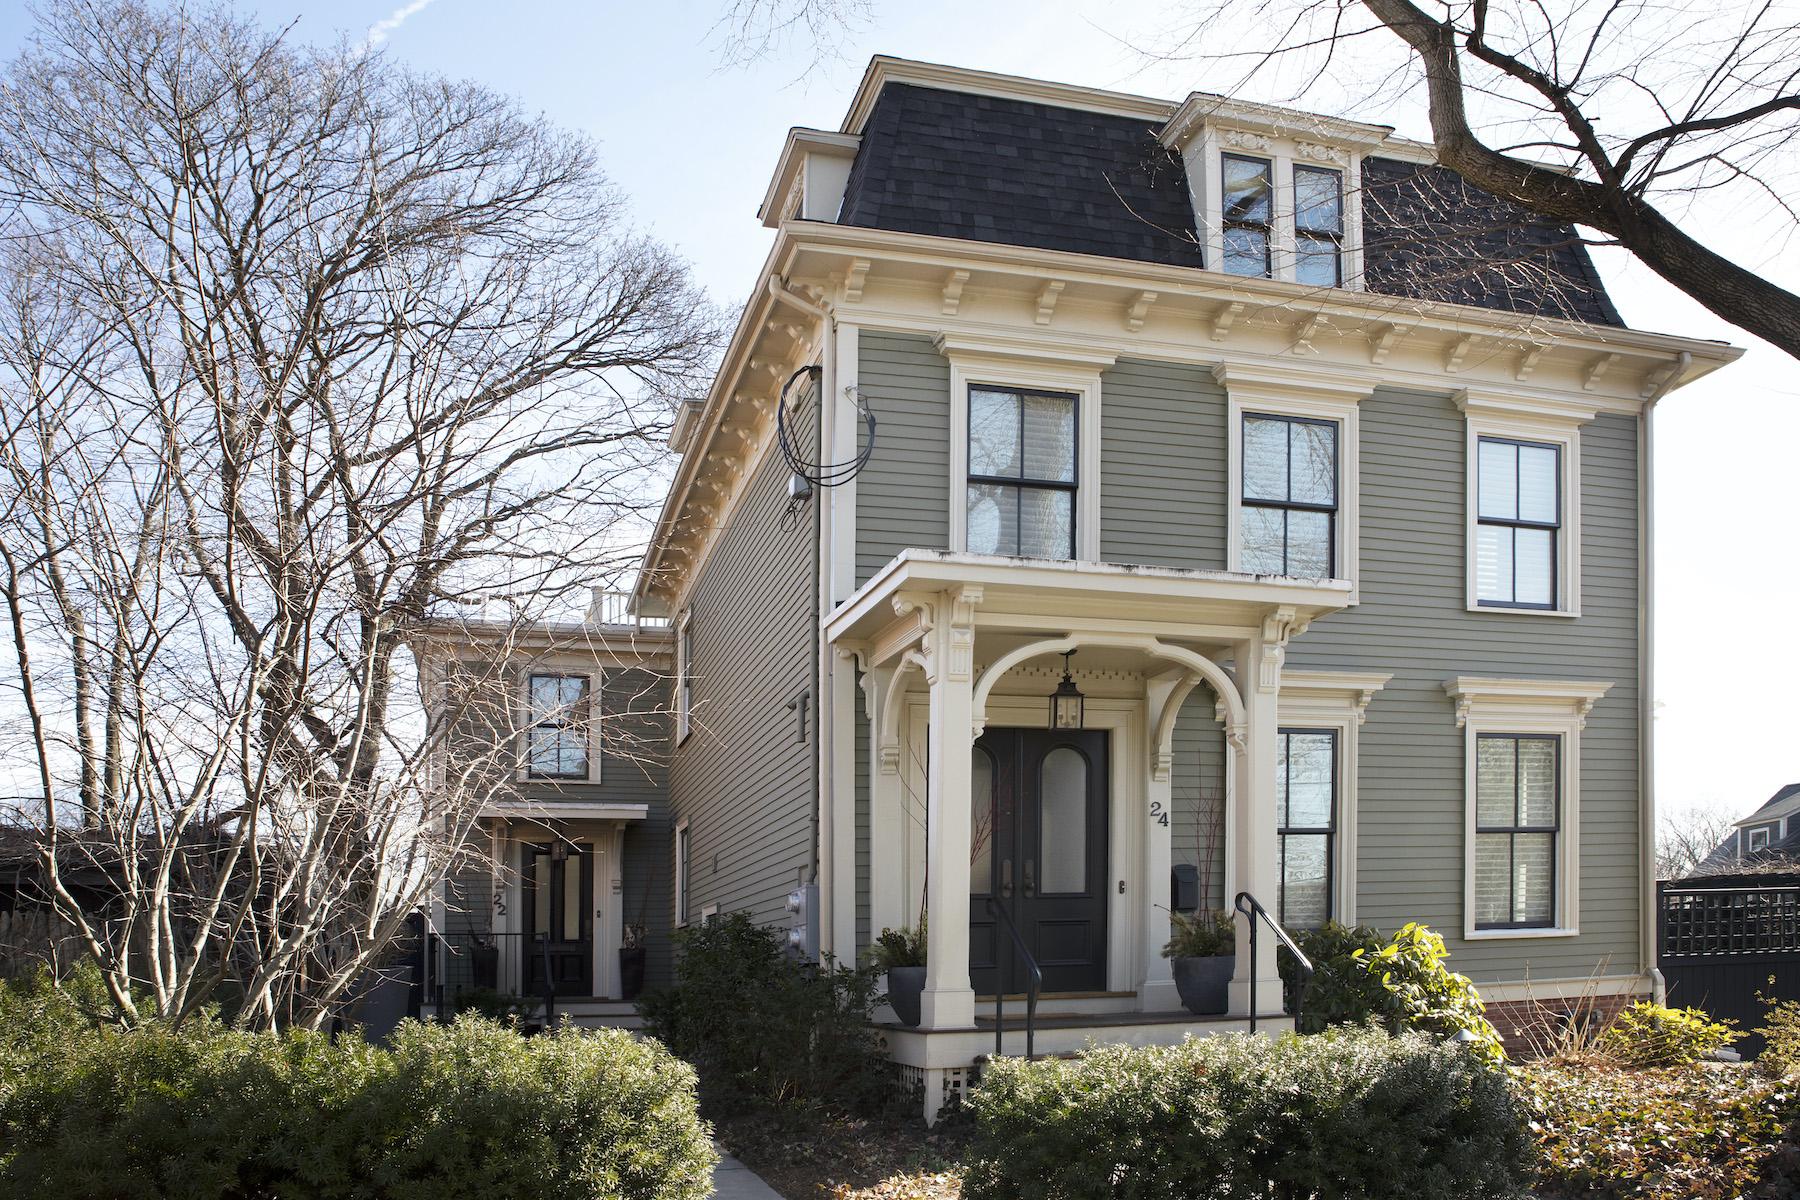 Condominiums για την Πώληση στο 22 Lowell Street, Unit 22 Cambridge, Μασαχουσετη 02138 Ηνωμένες Πολιτείες